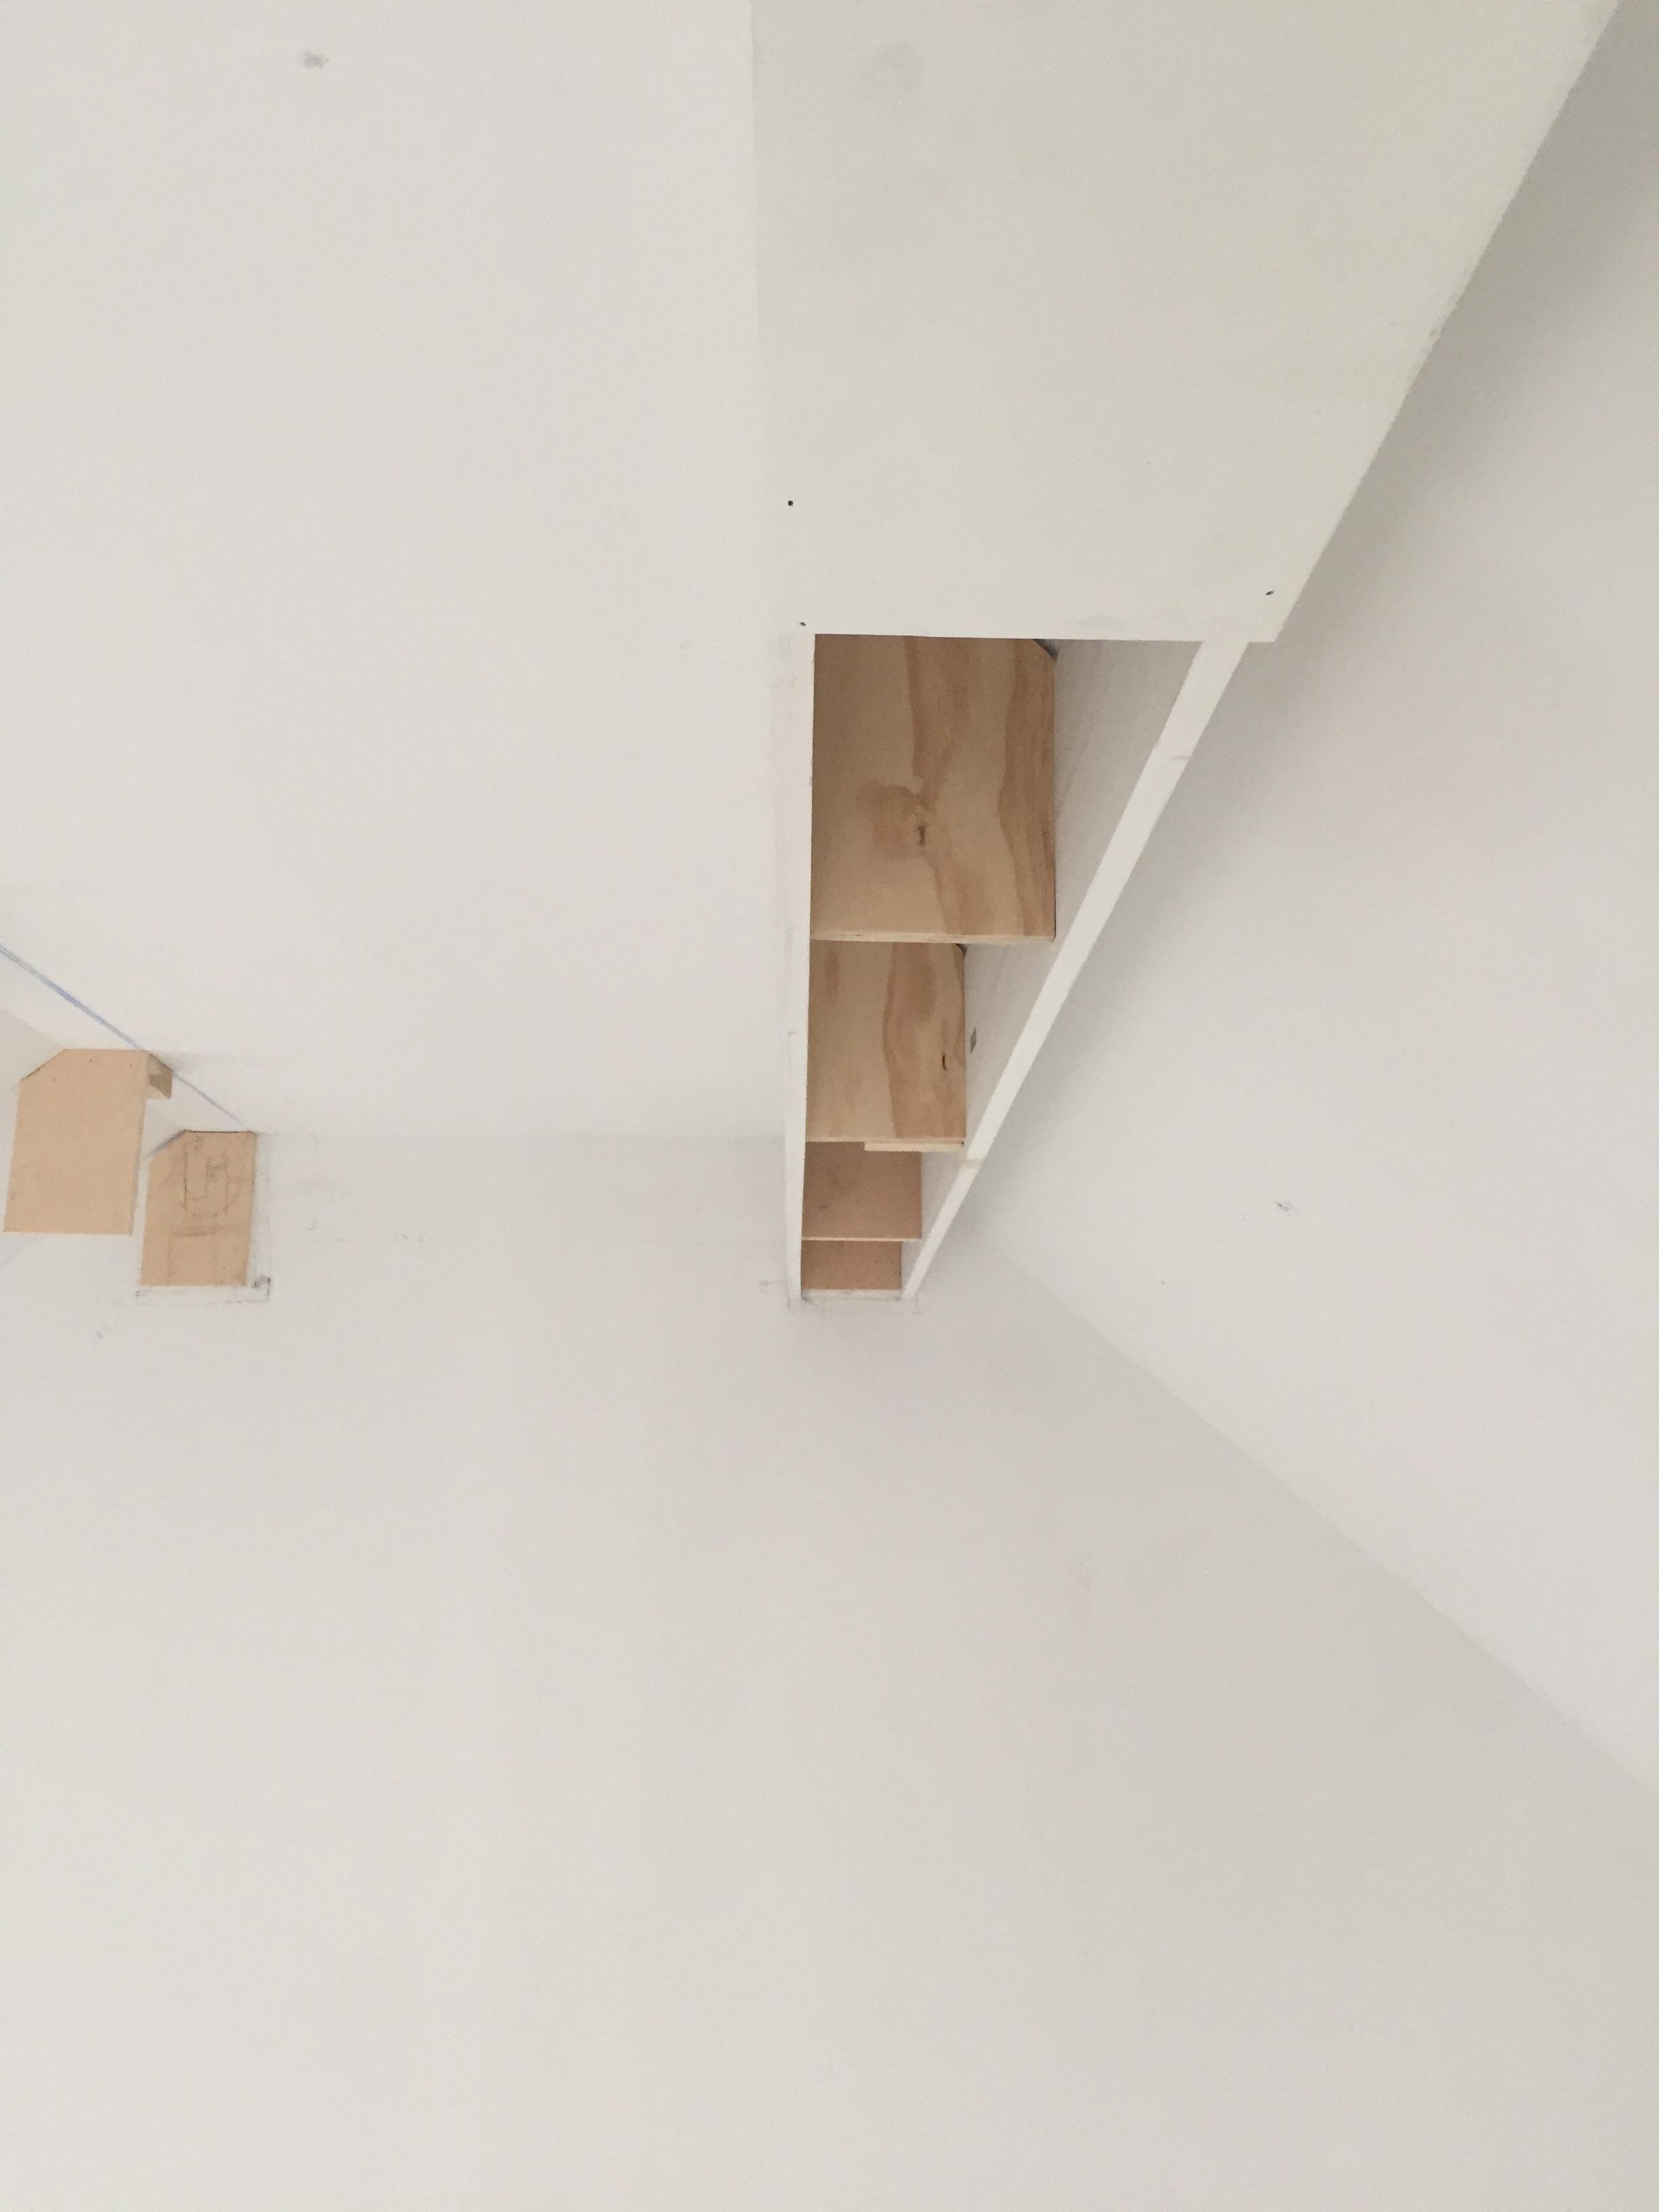 Box beams-279562a6-6f6b-4d14-aef9-835461d99e82_1518052419307.jpeg